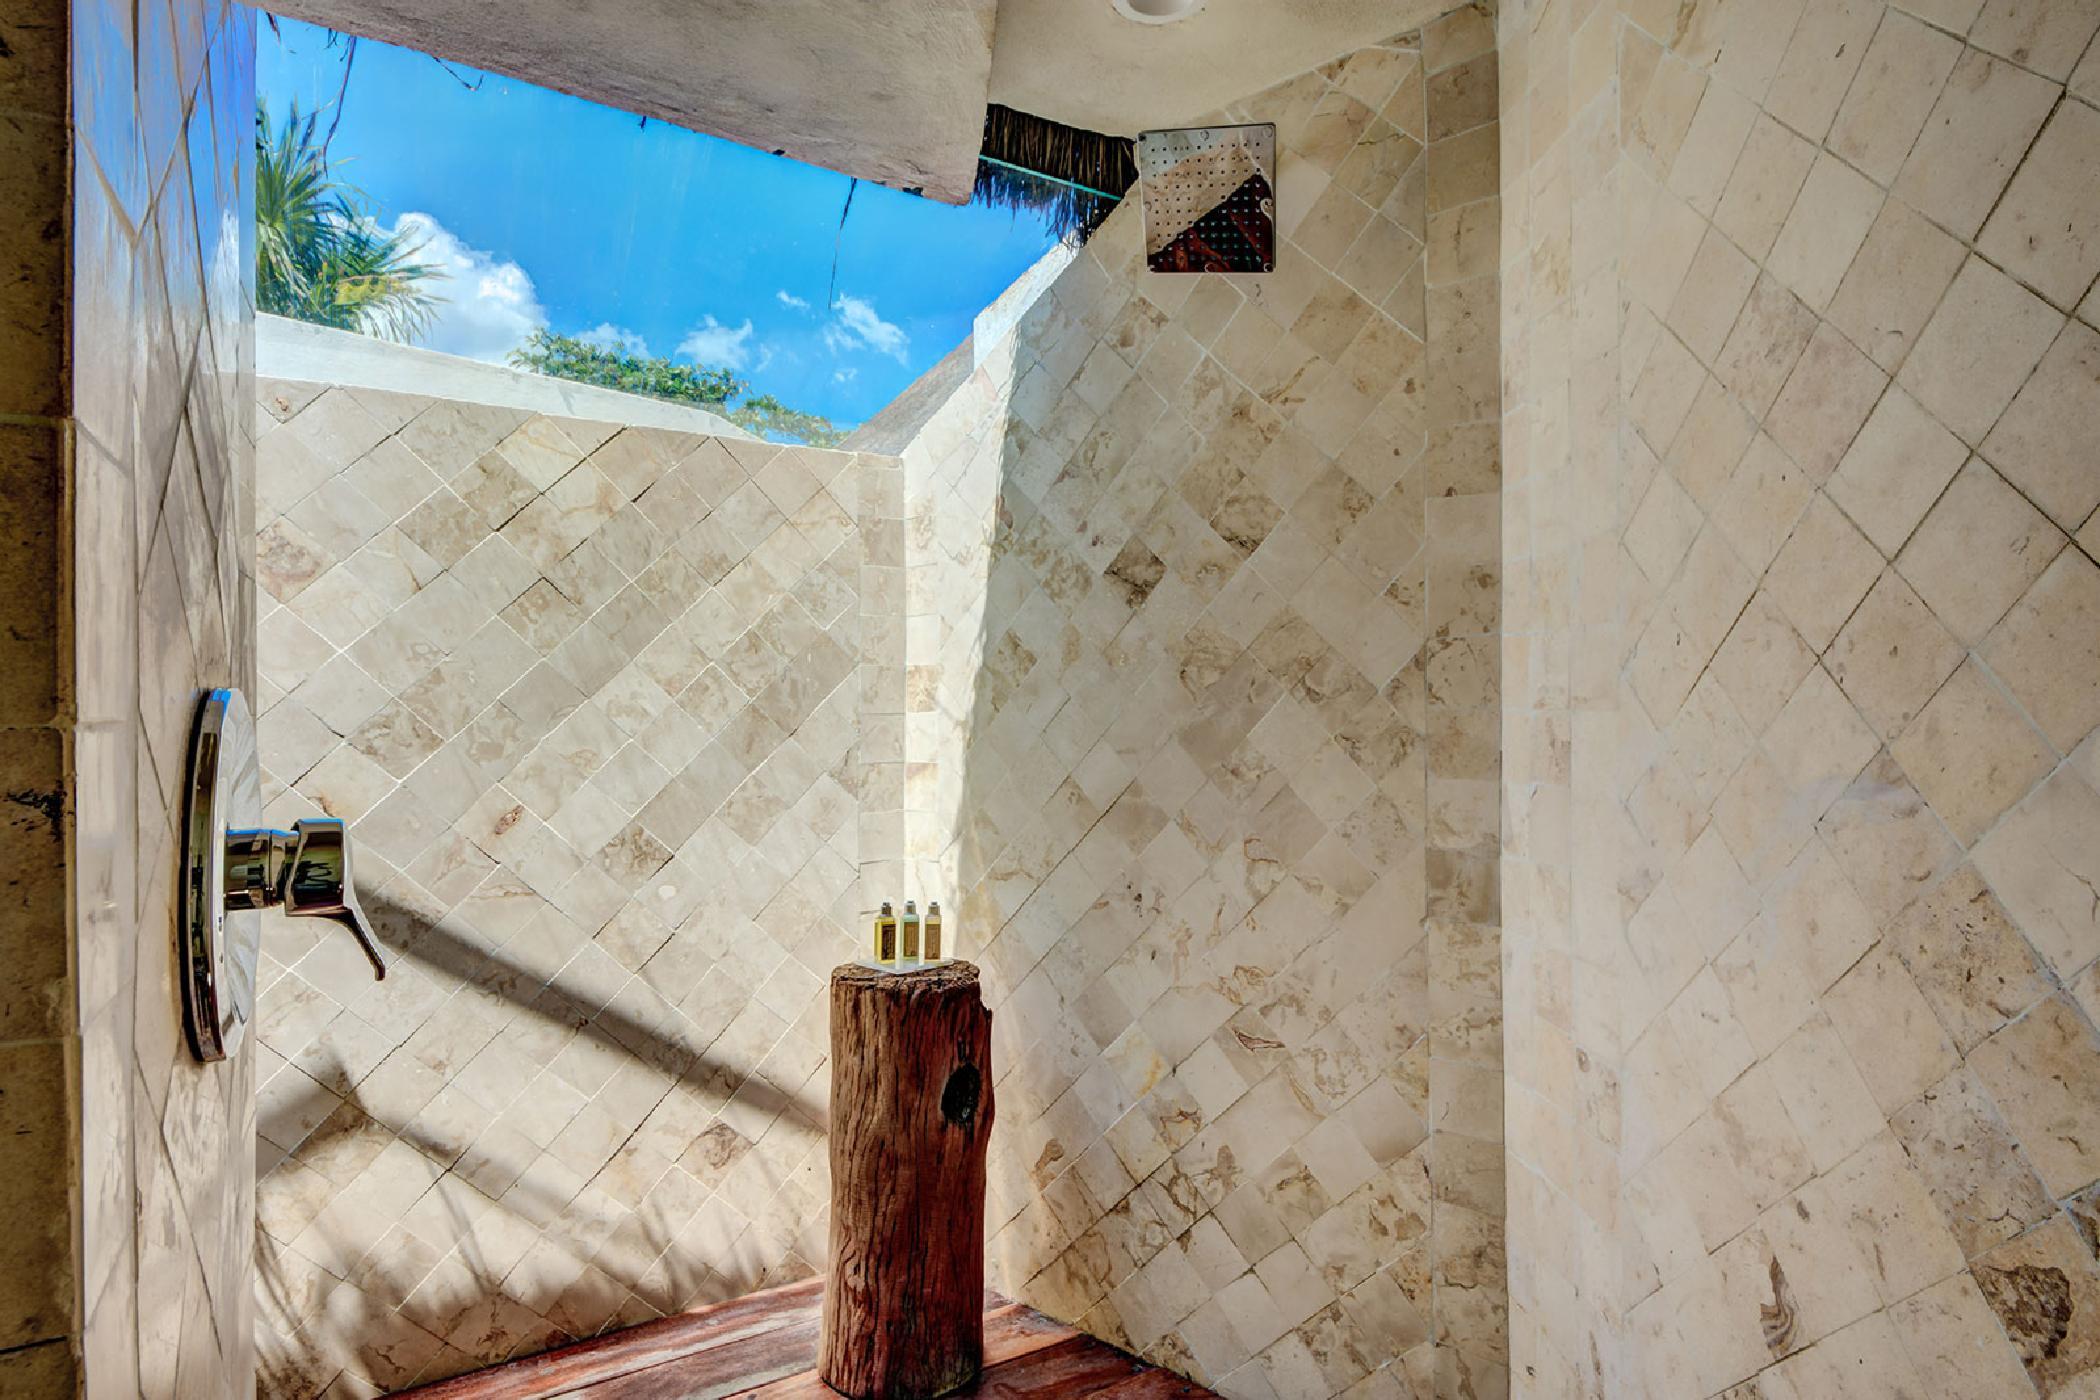 Maya_Luxe_Riviera_Maya_Luxury_Villas_Experiences_Puerto_Aventuras_5_Bedrooms_Zacil_Na_17.jpg